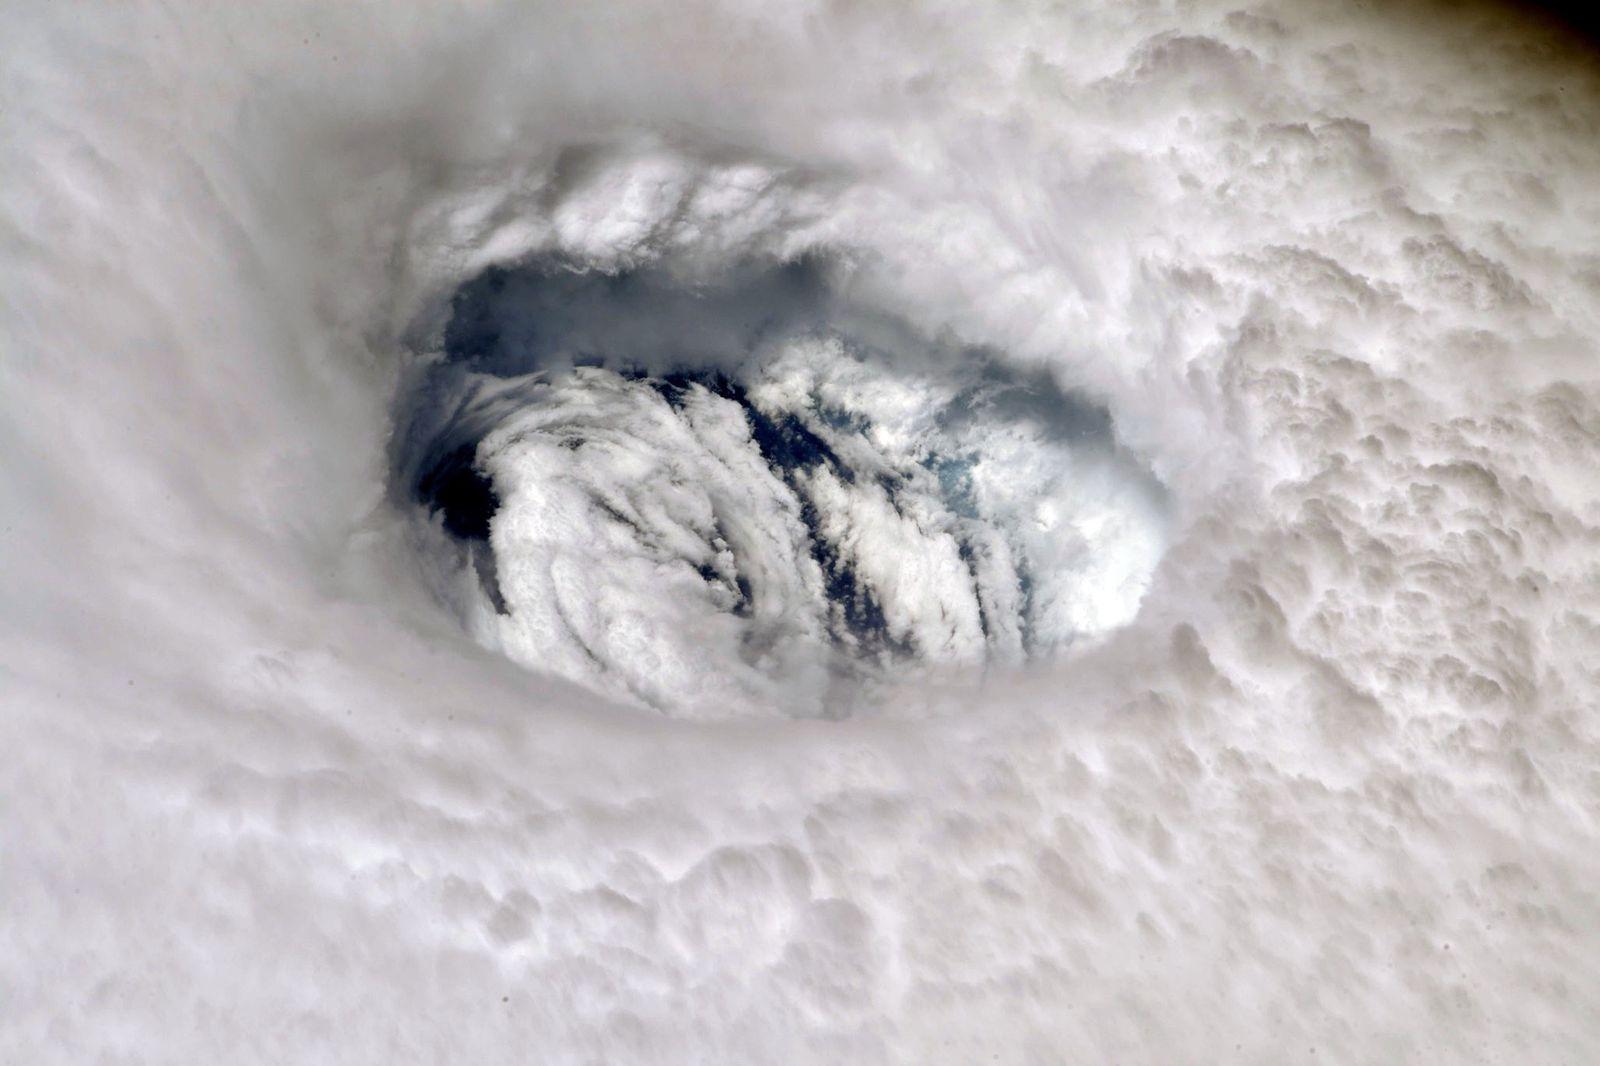 Como oceanos quentes potencializam furacões fatais